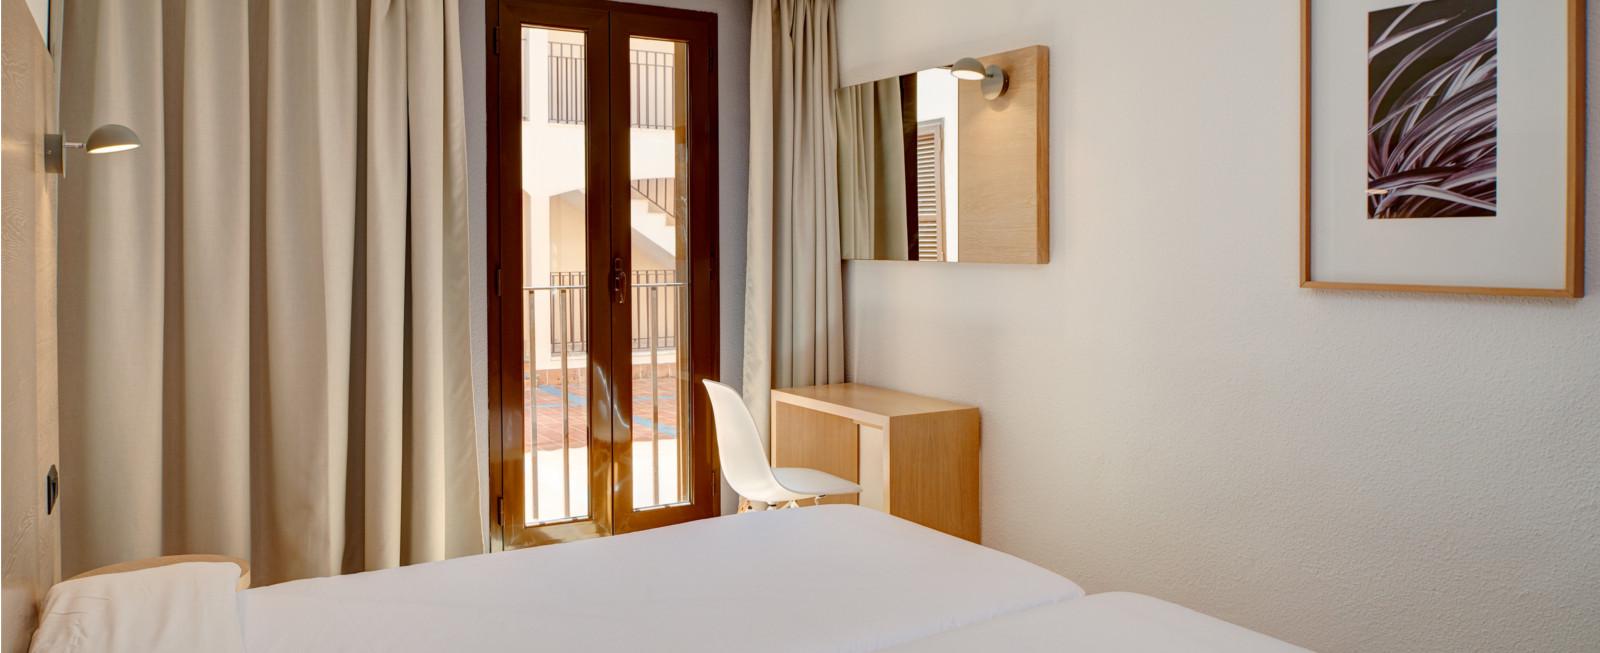 Protur Floriana Resort Aparthotel Cala Bona, Mallorca Más info [+] Apartamento